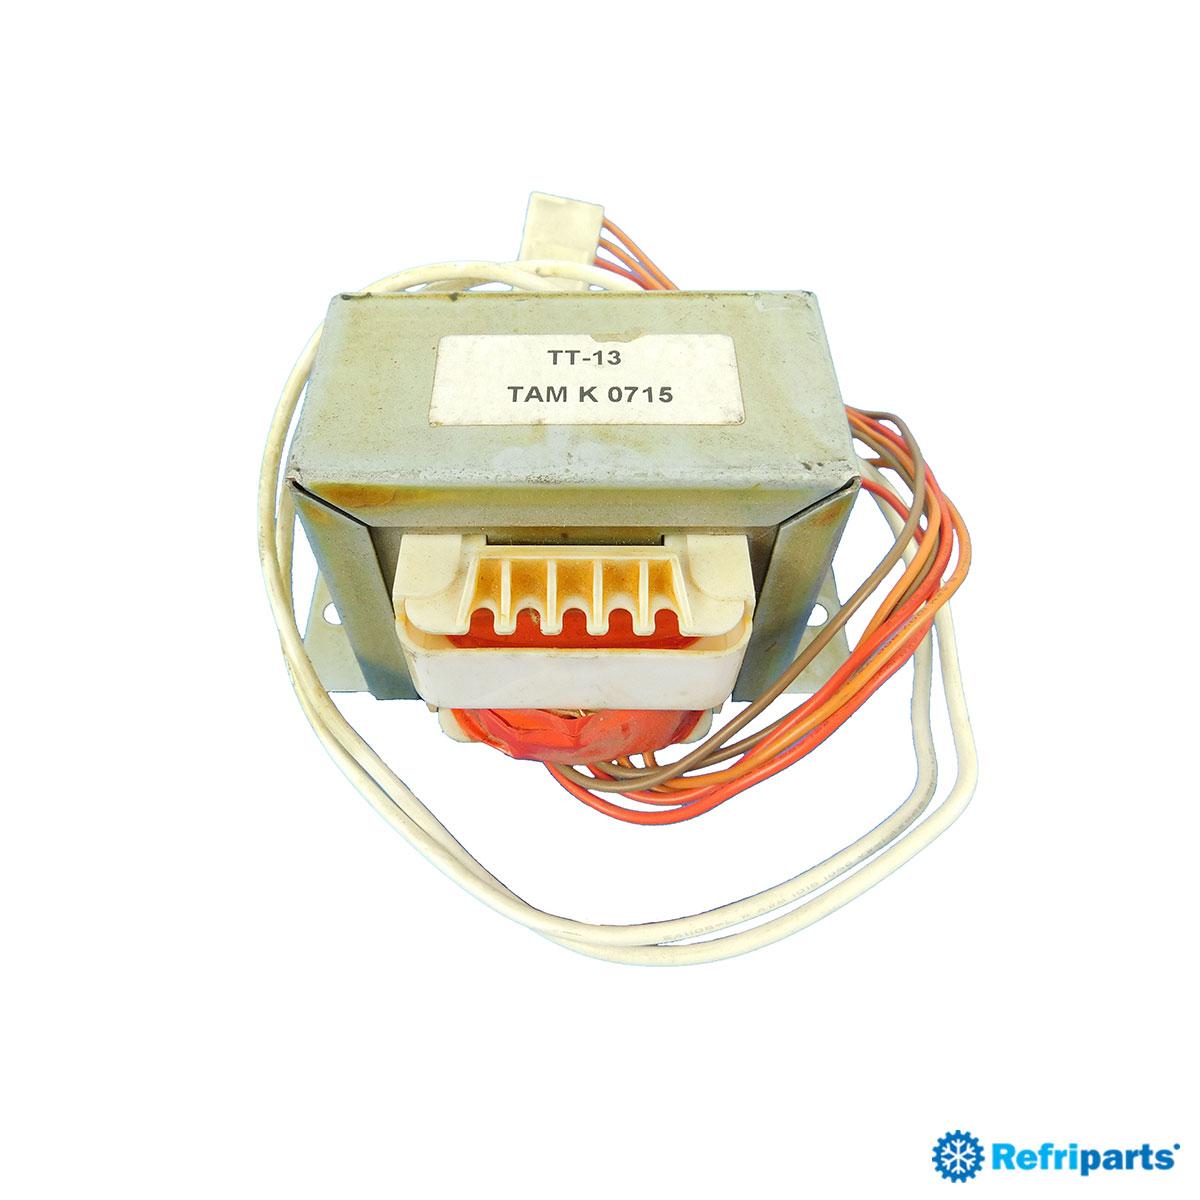 Transformador Tt-13 Ac 220-240v 50/60hz